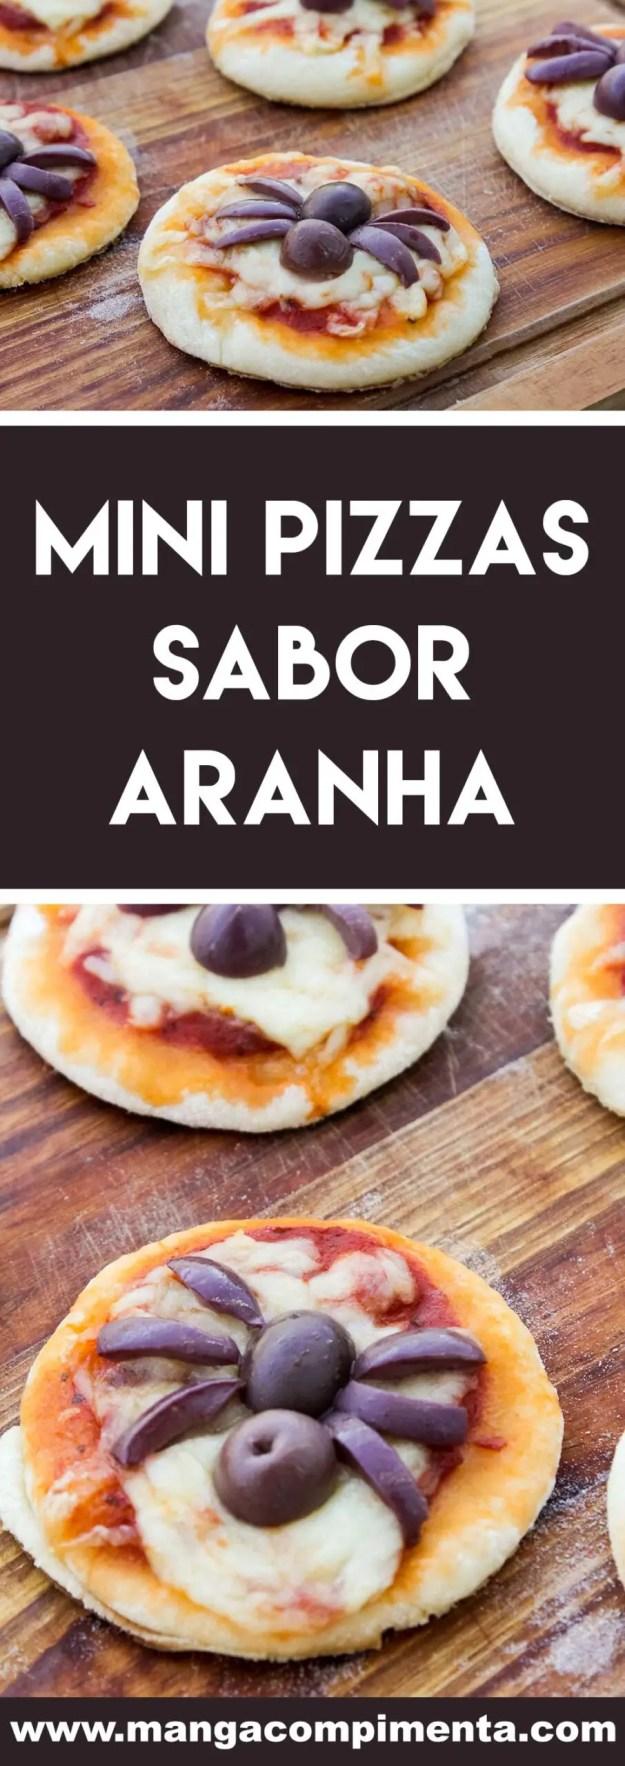 Receita de Mini Pizzas sabor Aranha - para o lanche das bruxas e magos que moram na sua casa!